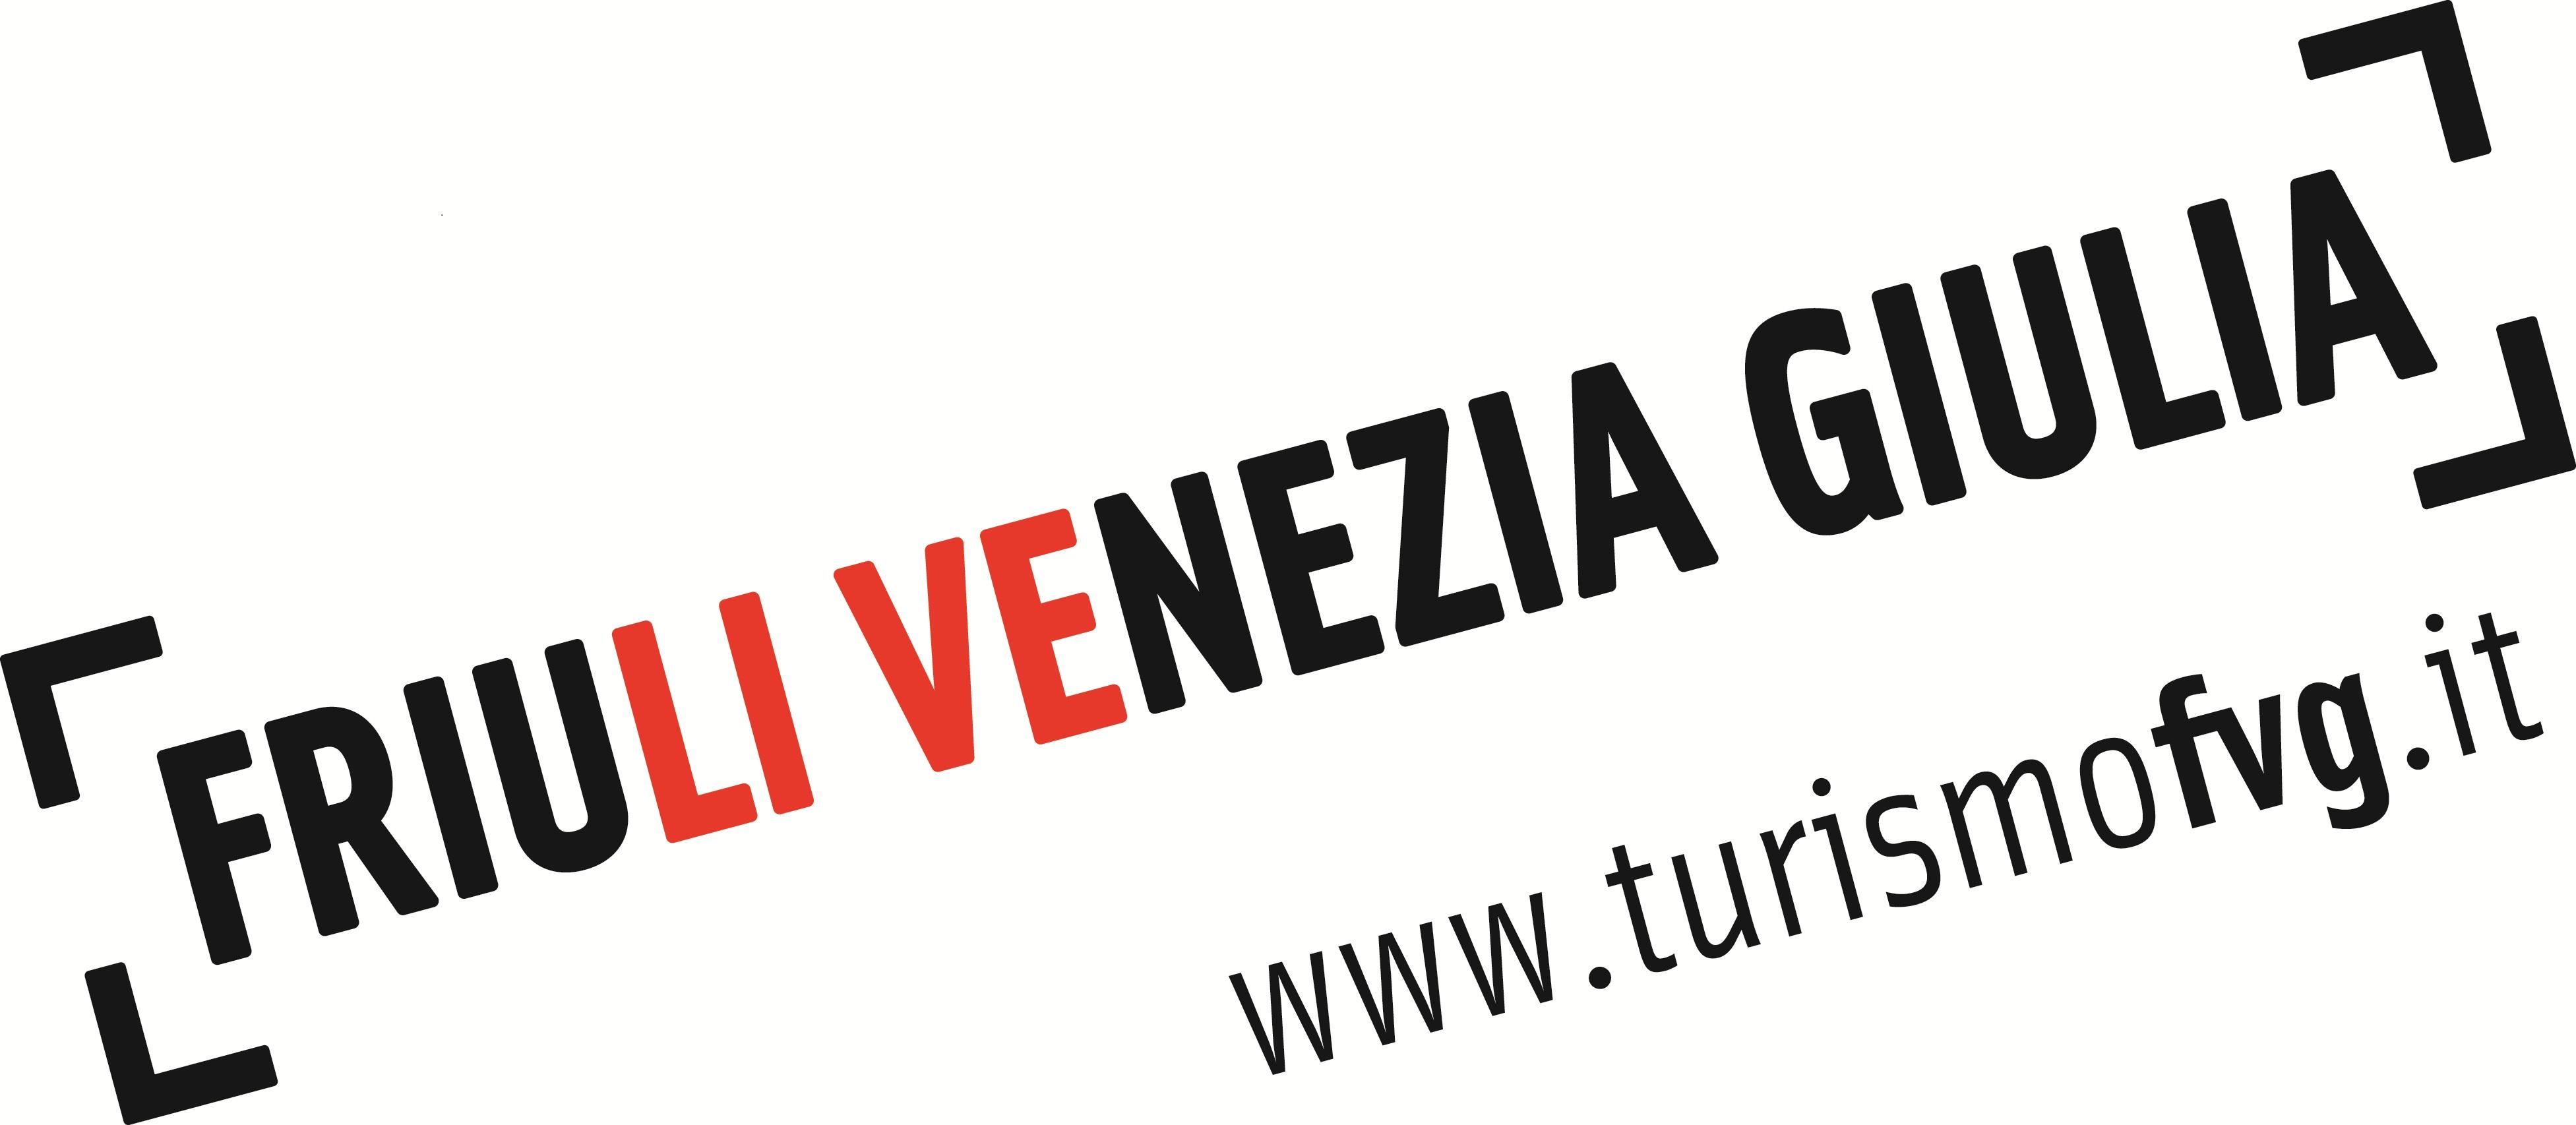 Turisomo Friuli Venezia Giulia